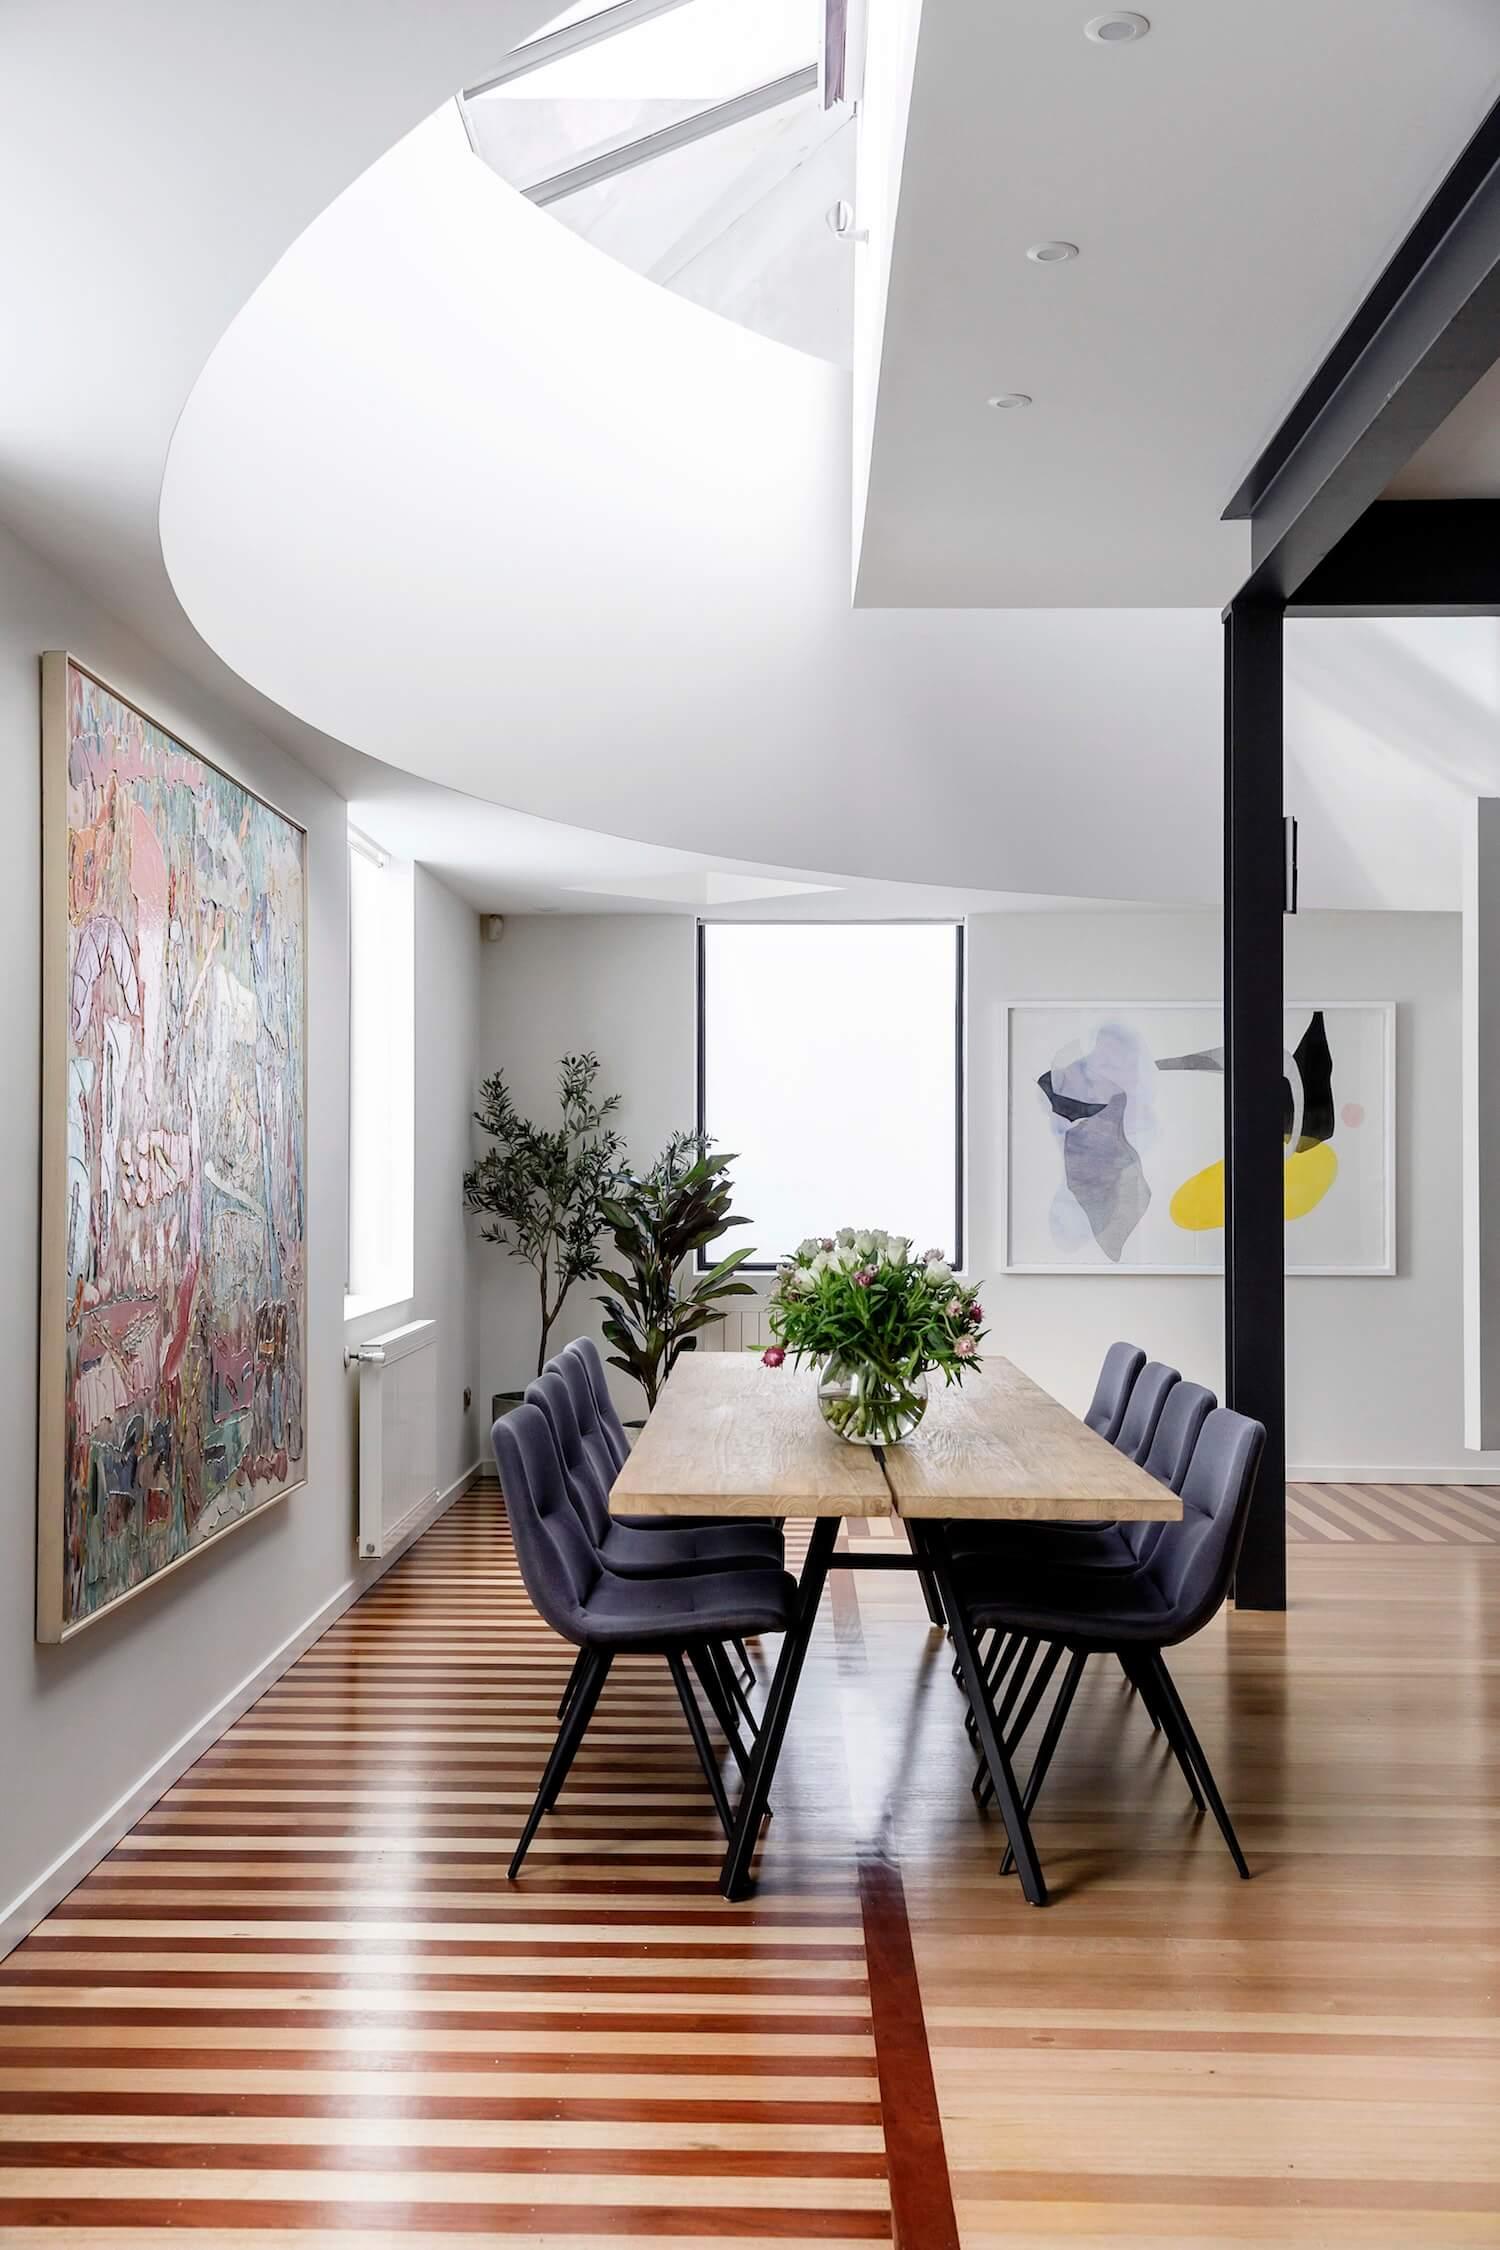 est living open house 423 napier street fitzroy 2